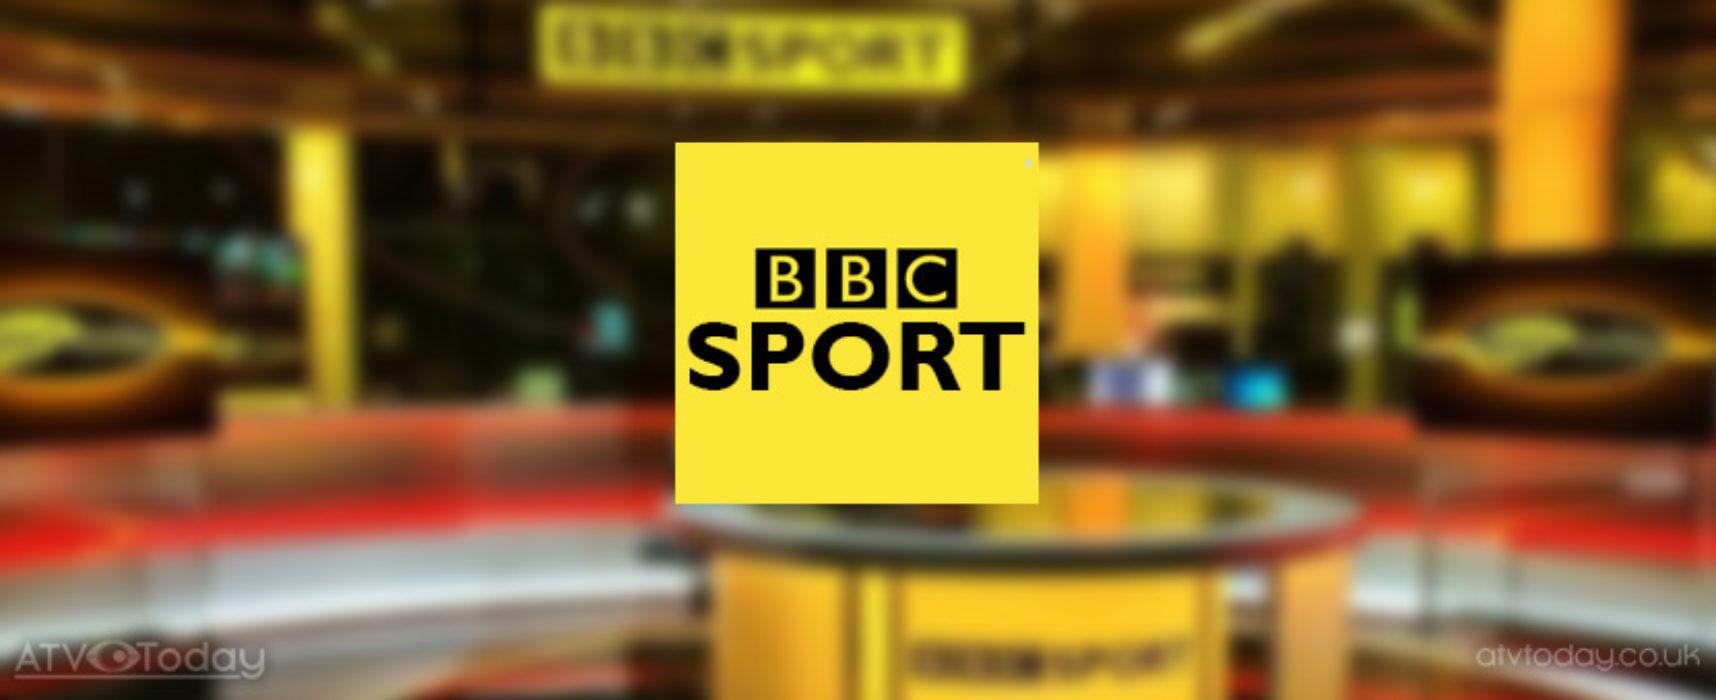 BBC announce Winter Olympics digital coverage